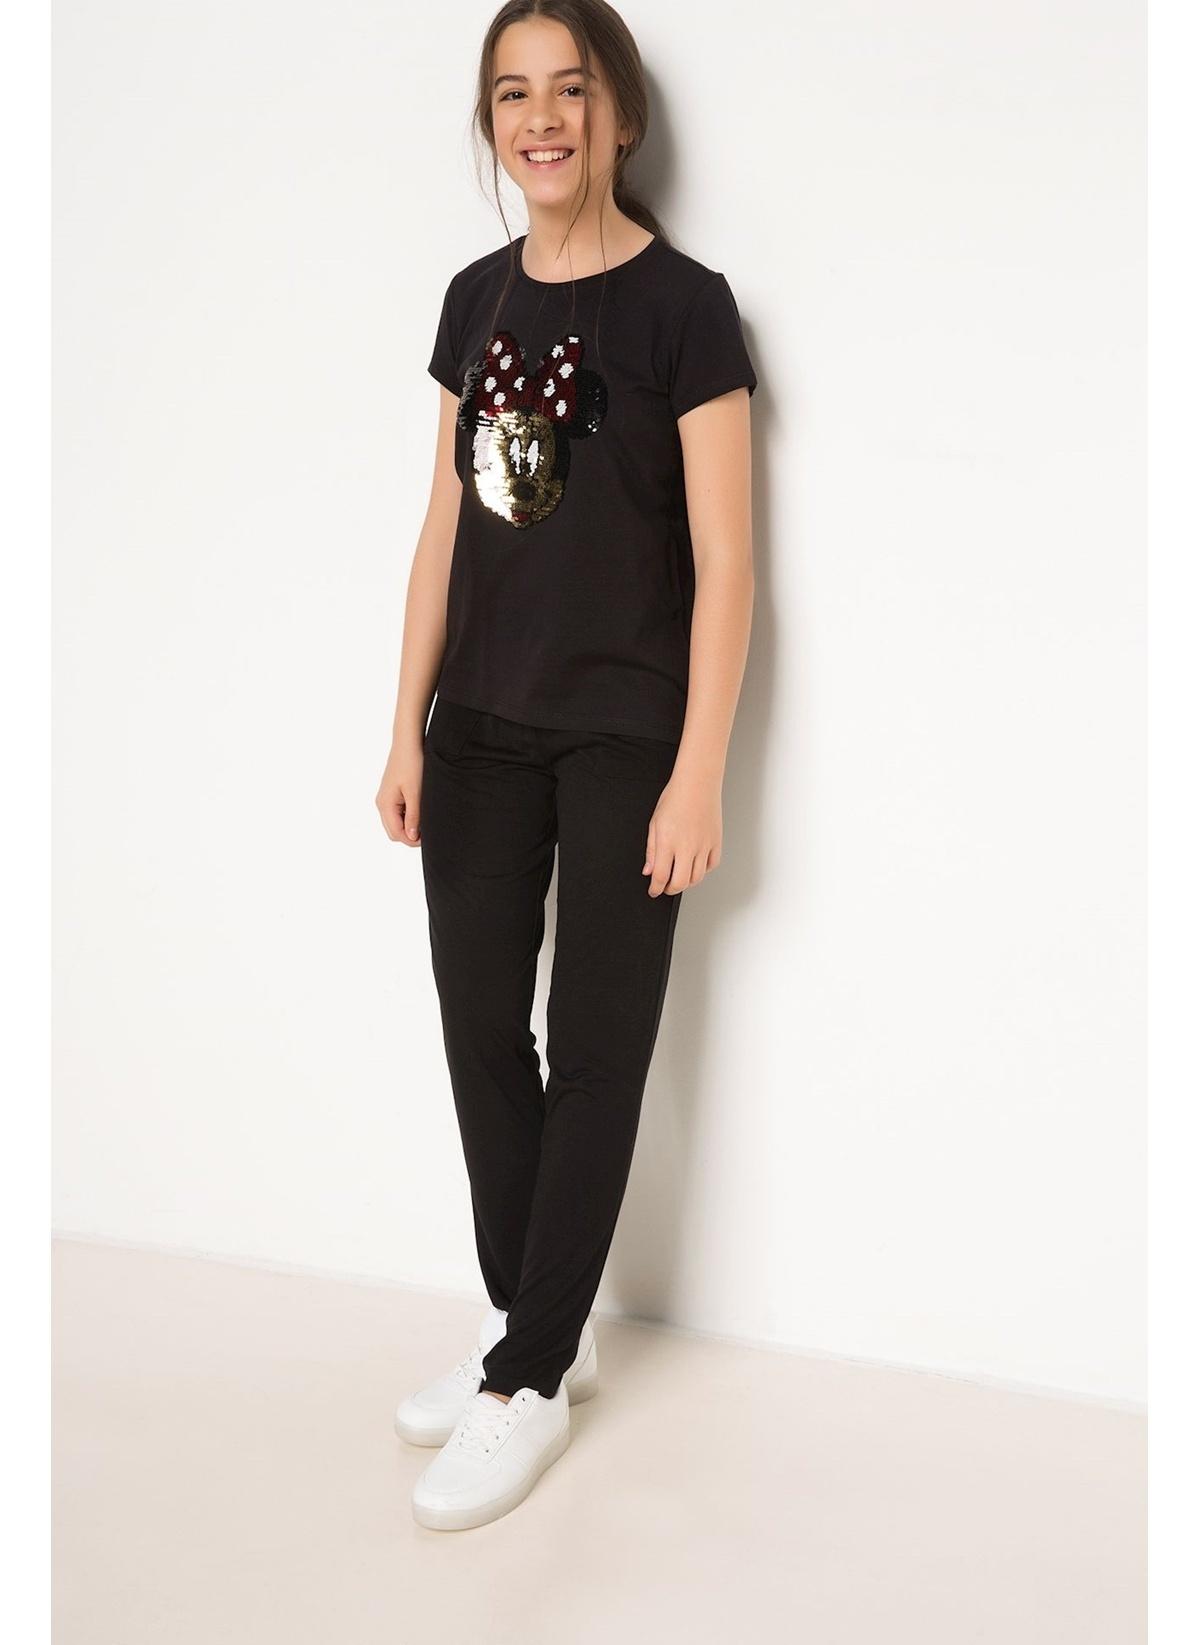 Defacto Pantolon G8327a6z17spbk27 Genç Kız Pantolon – 19.99 TL